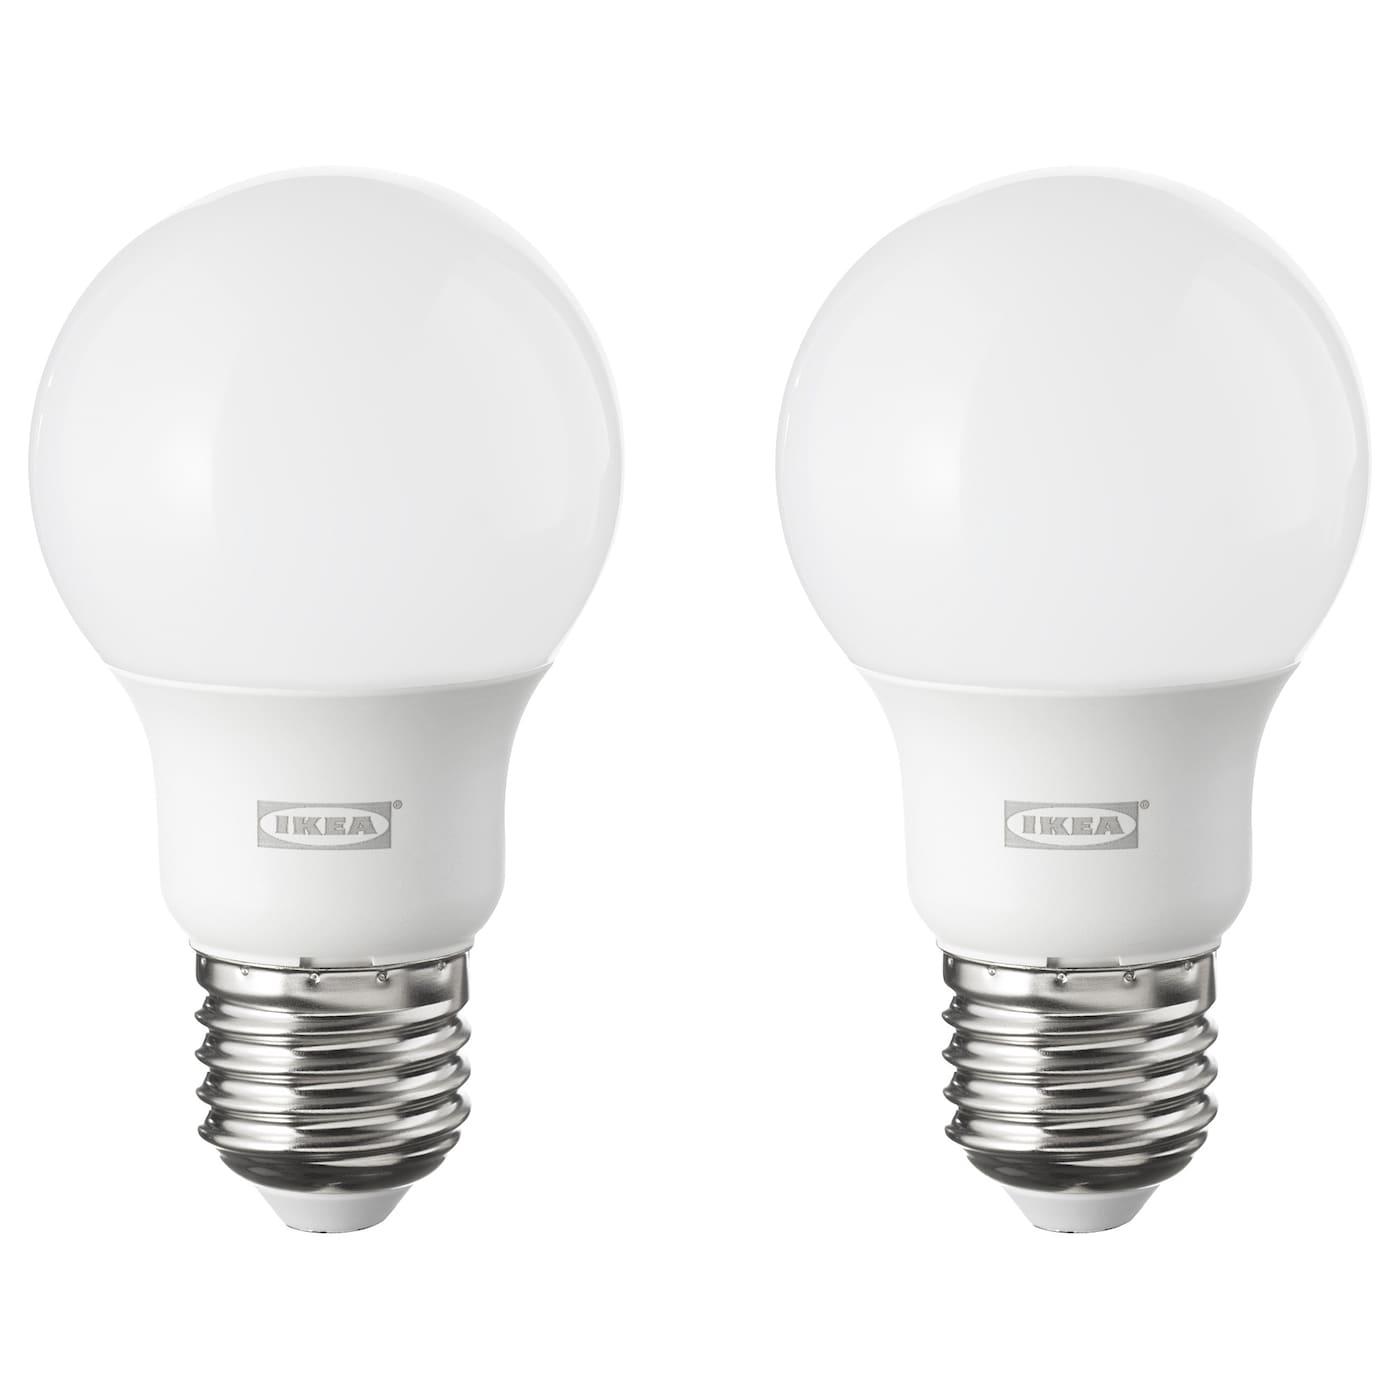 luminaire eclairage lampes luminaires design ikea. Black Bedroom Furniture Sets. Home Design Ideas